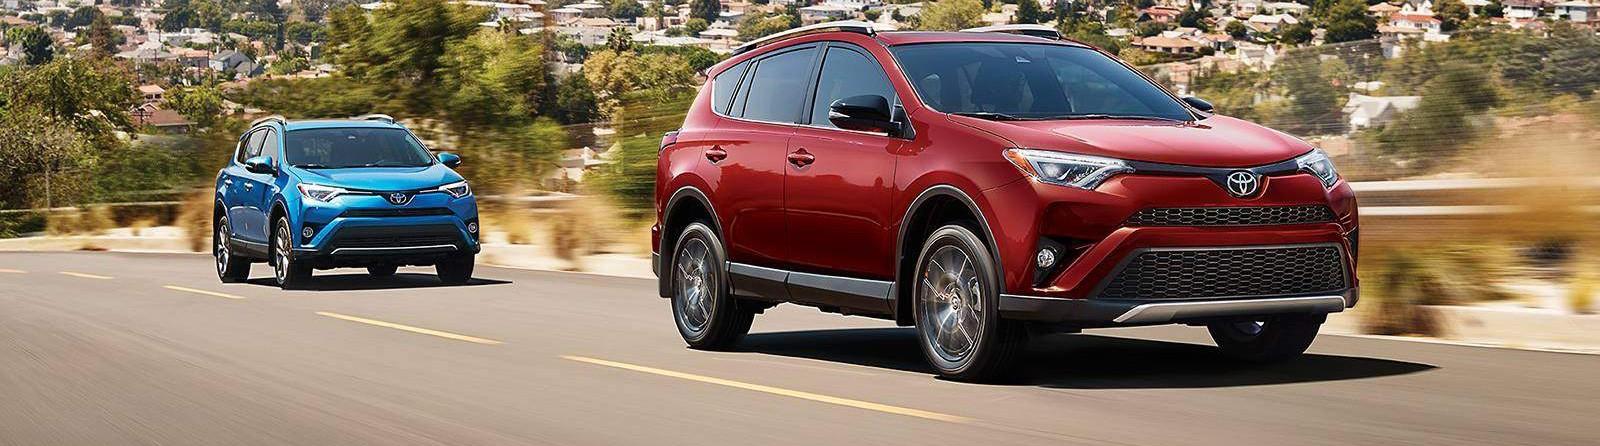 new vehicle warranty amp coverage   wietzes toyota